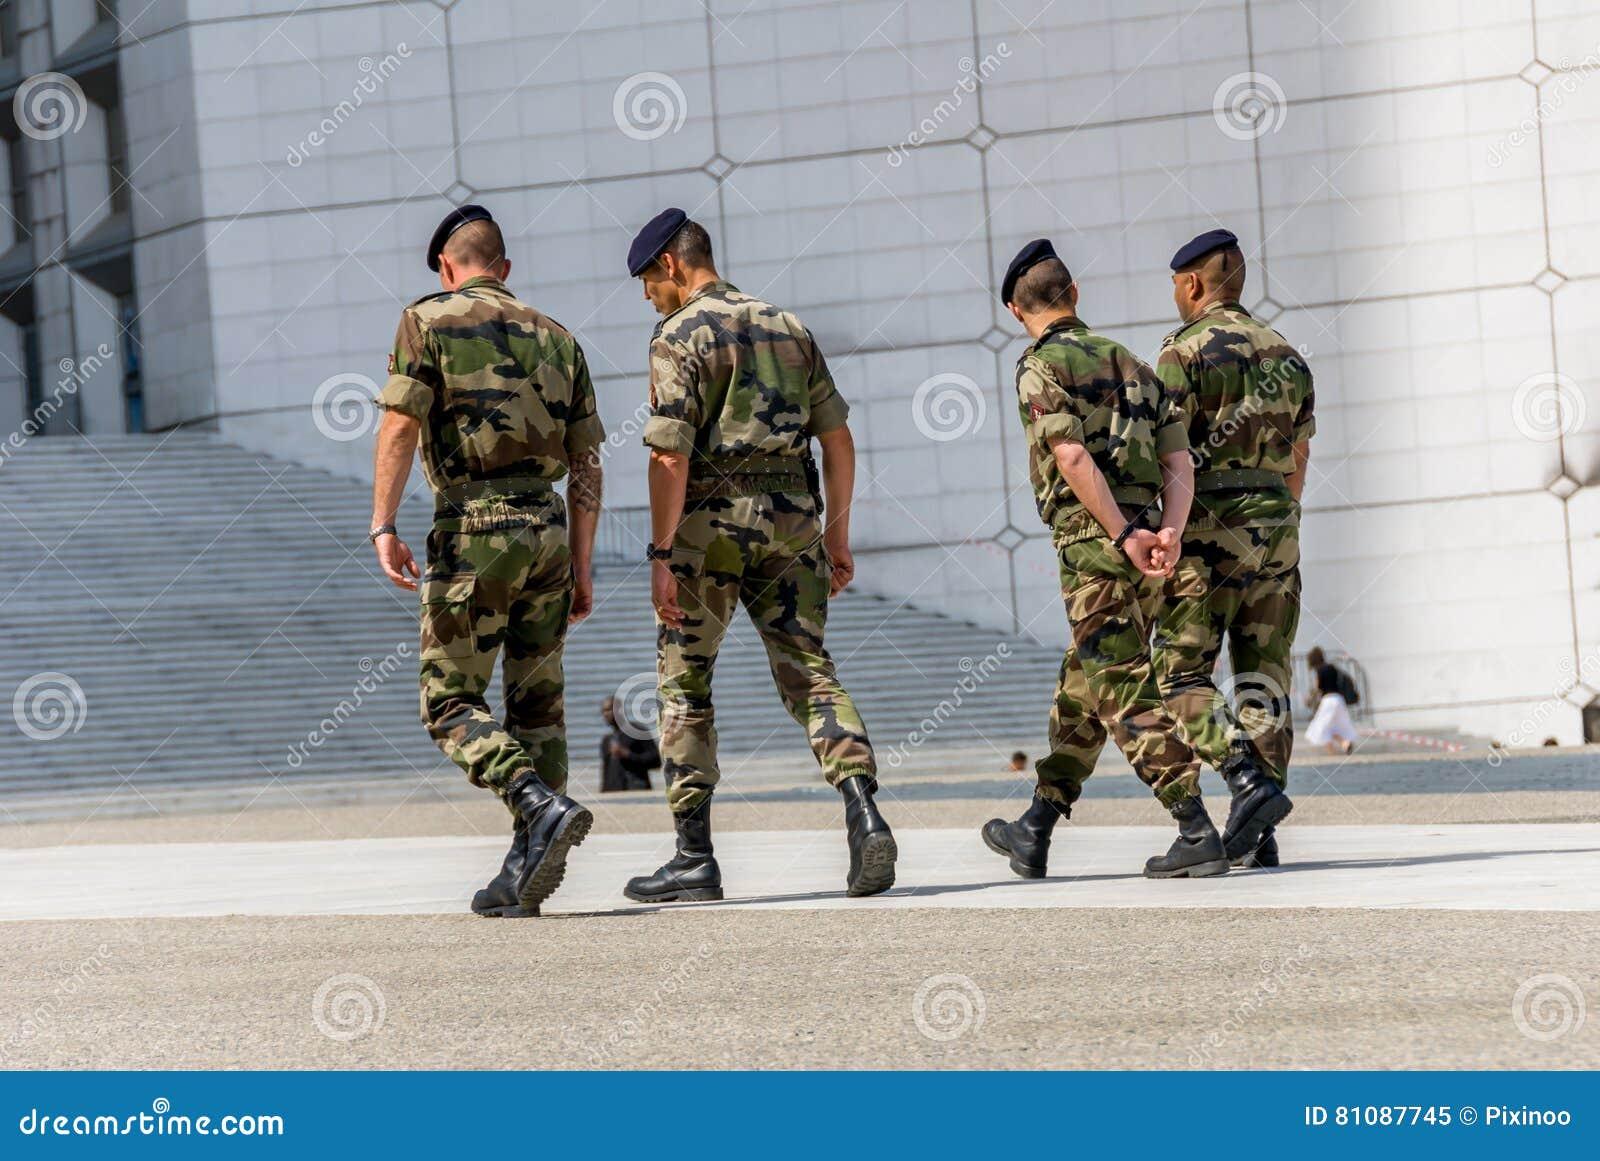 La防御,法国- Mai 12日2007年:法国军事巡逻分配到商业区的监视在巴黎附近 这些tr